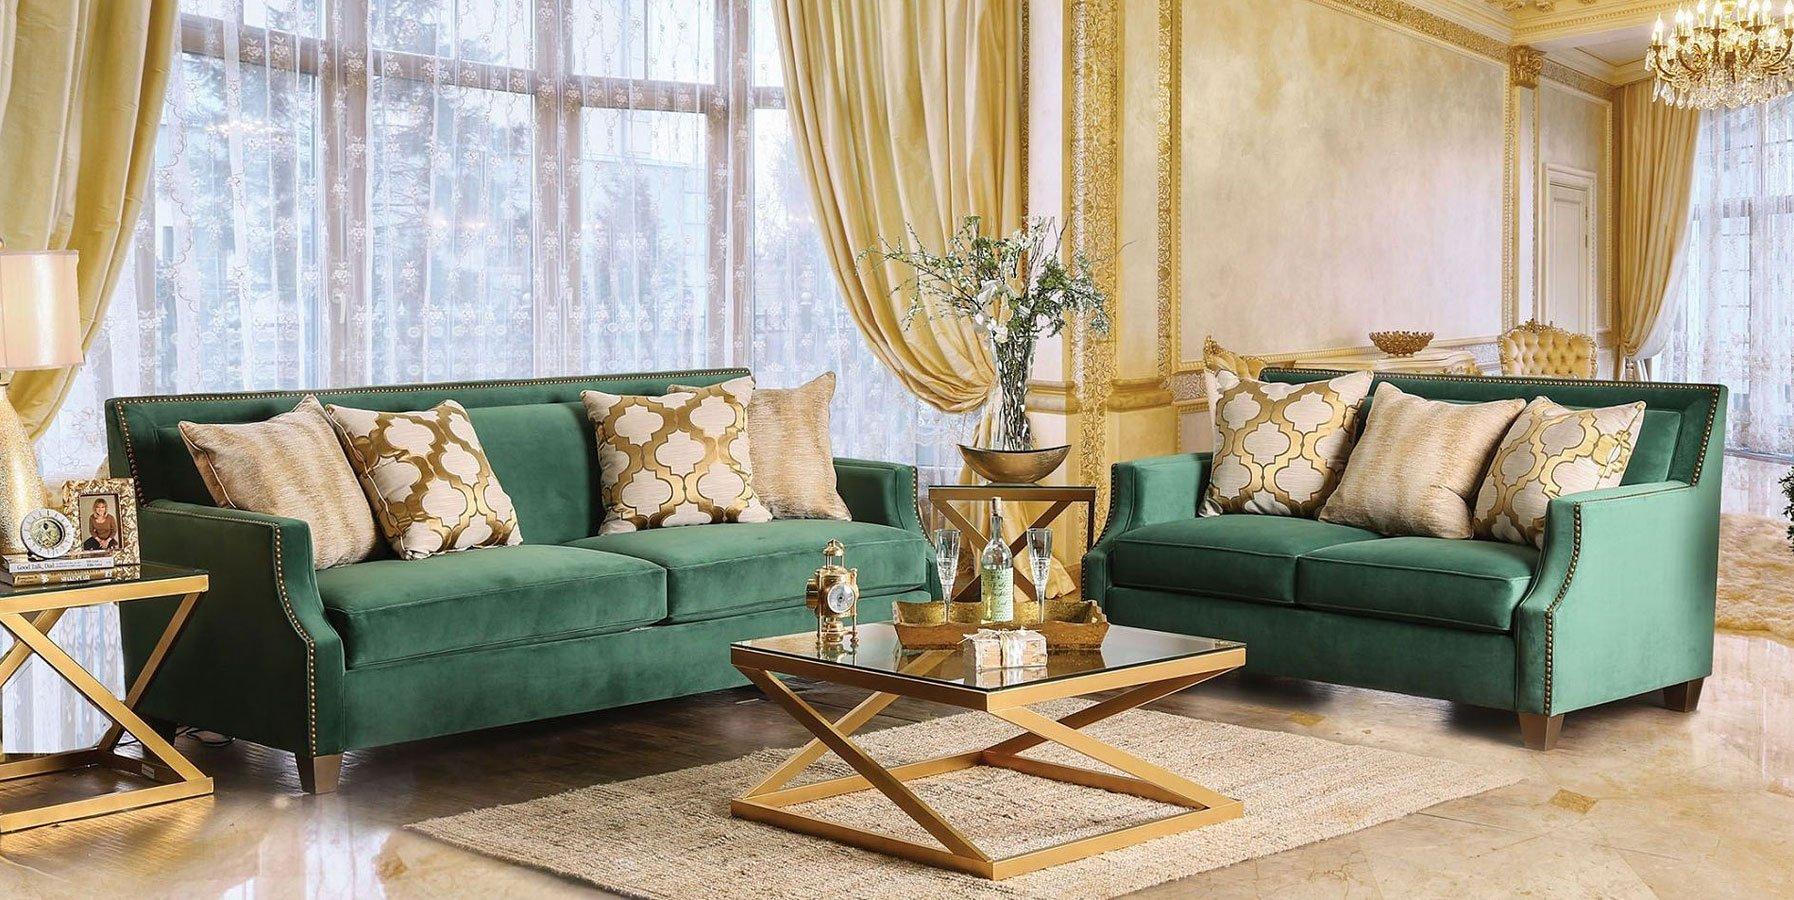 Verdante Living Room Set Emerald Green Living Room Sets Living Room Furniture Living Room